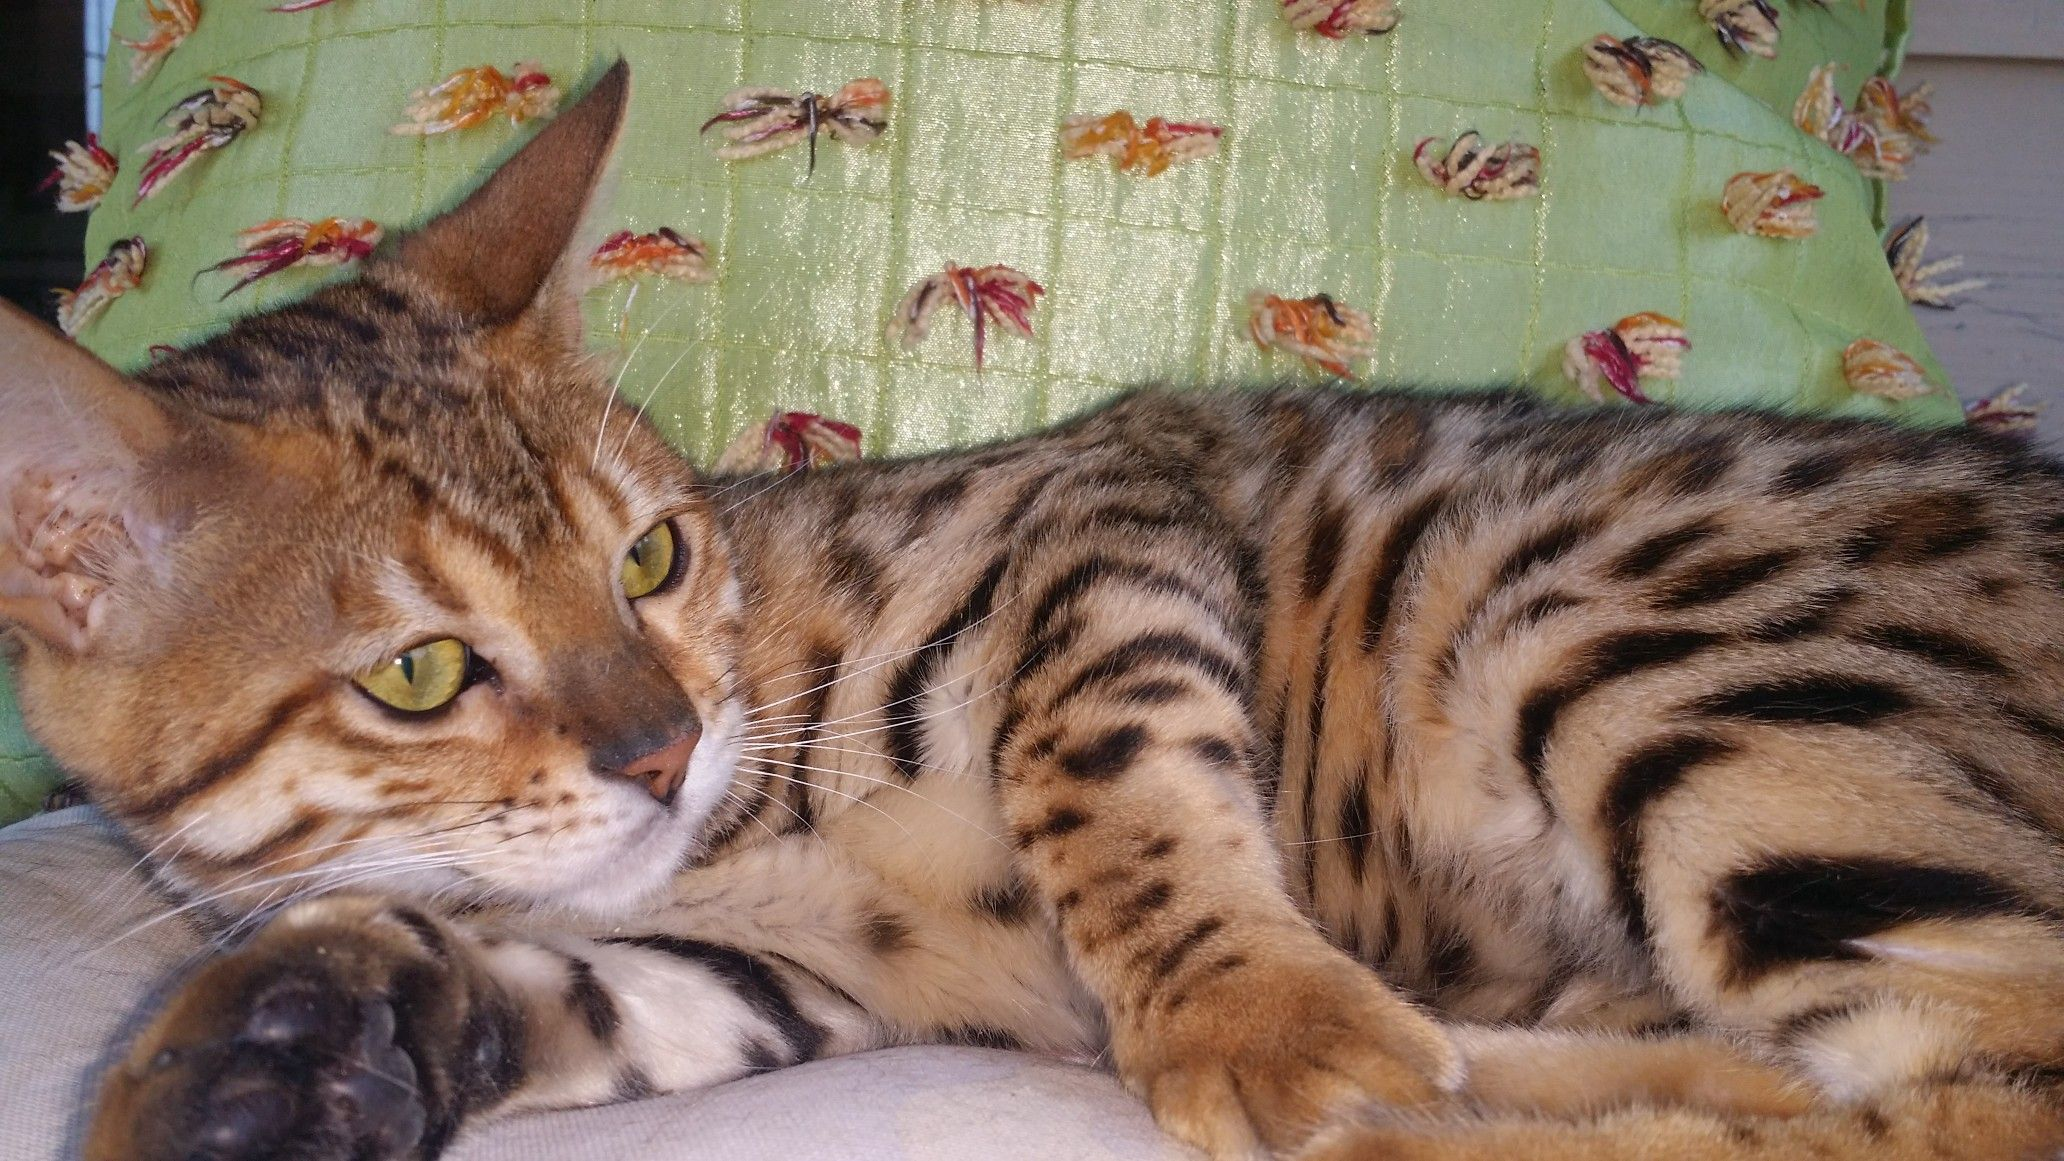 Brown Tabby Bengal Kitten Age 6 Months Belongs To Agapetxbengals In Texas Beautiful Rare Cat Breeds Bengal Kitten Rare Cats